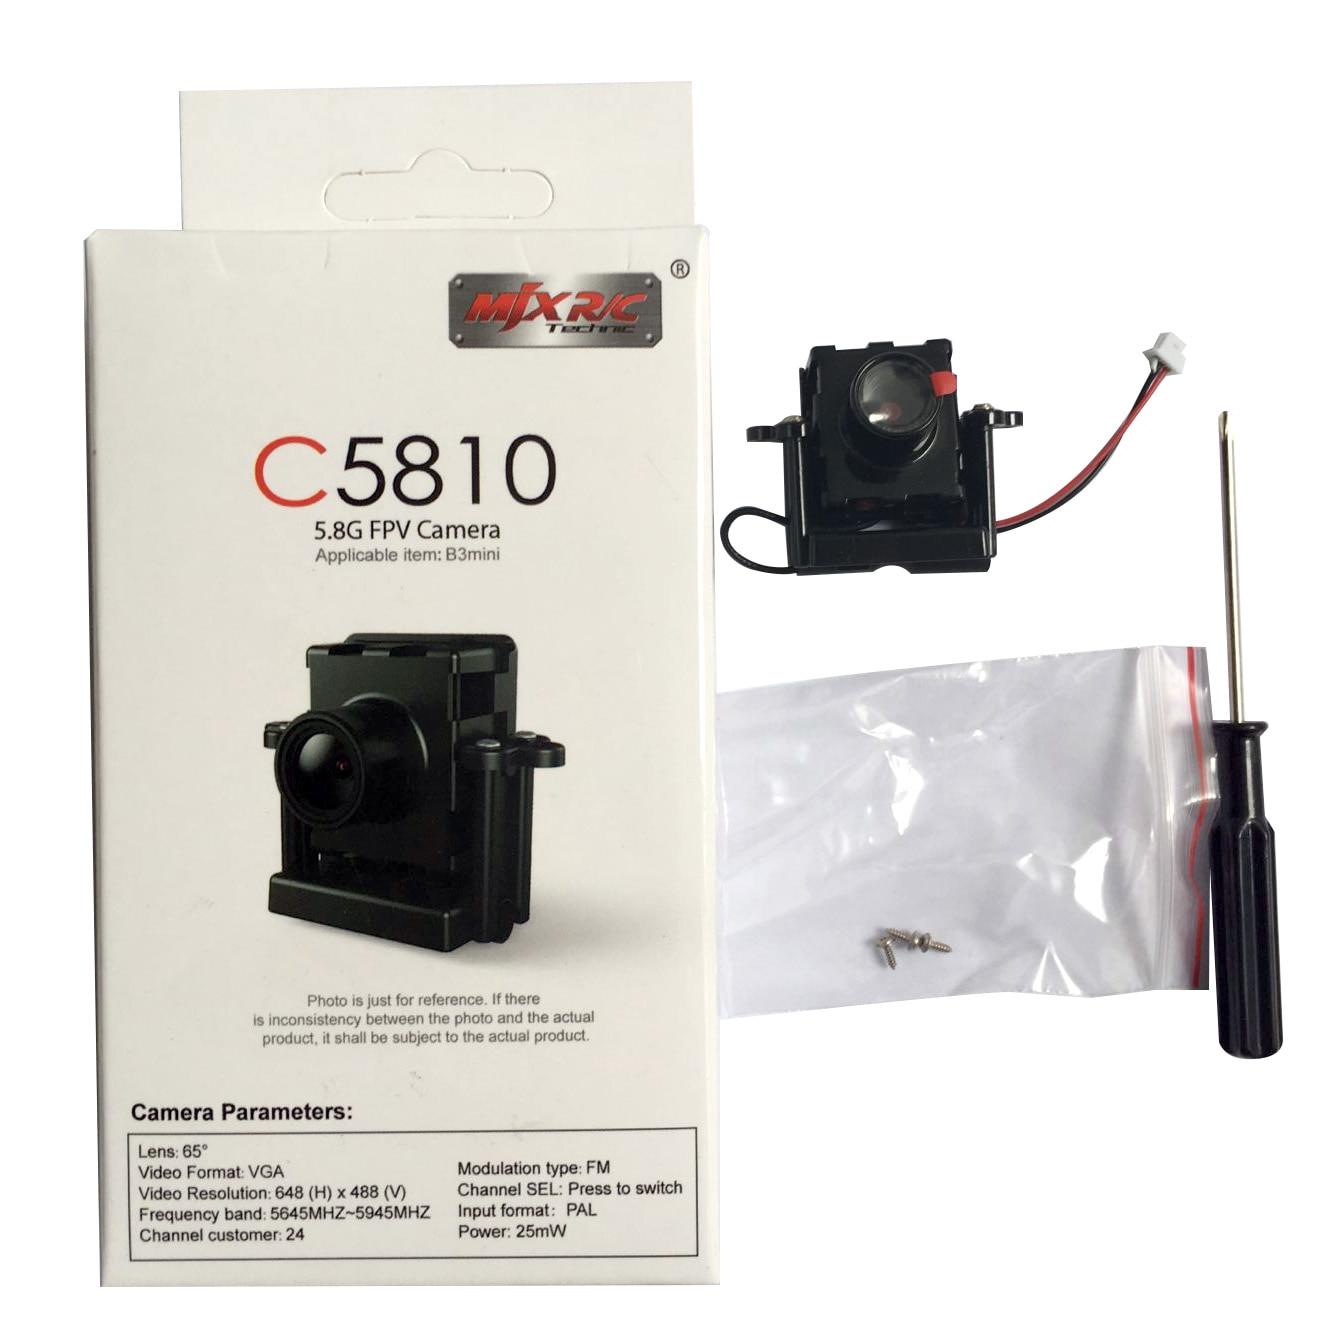 MJX C5810 5.8G FPV WIFI Camera for MJX Bugs 3 B3 Mini Brushless RC Quadcopter Cam D43 Monitor Replace C5007 Accessory mjx b3